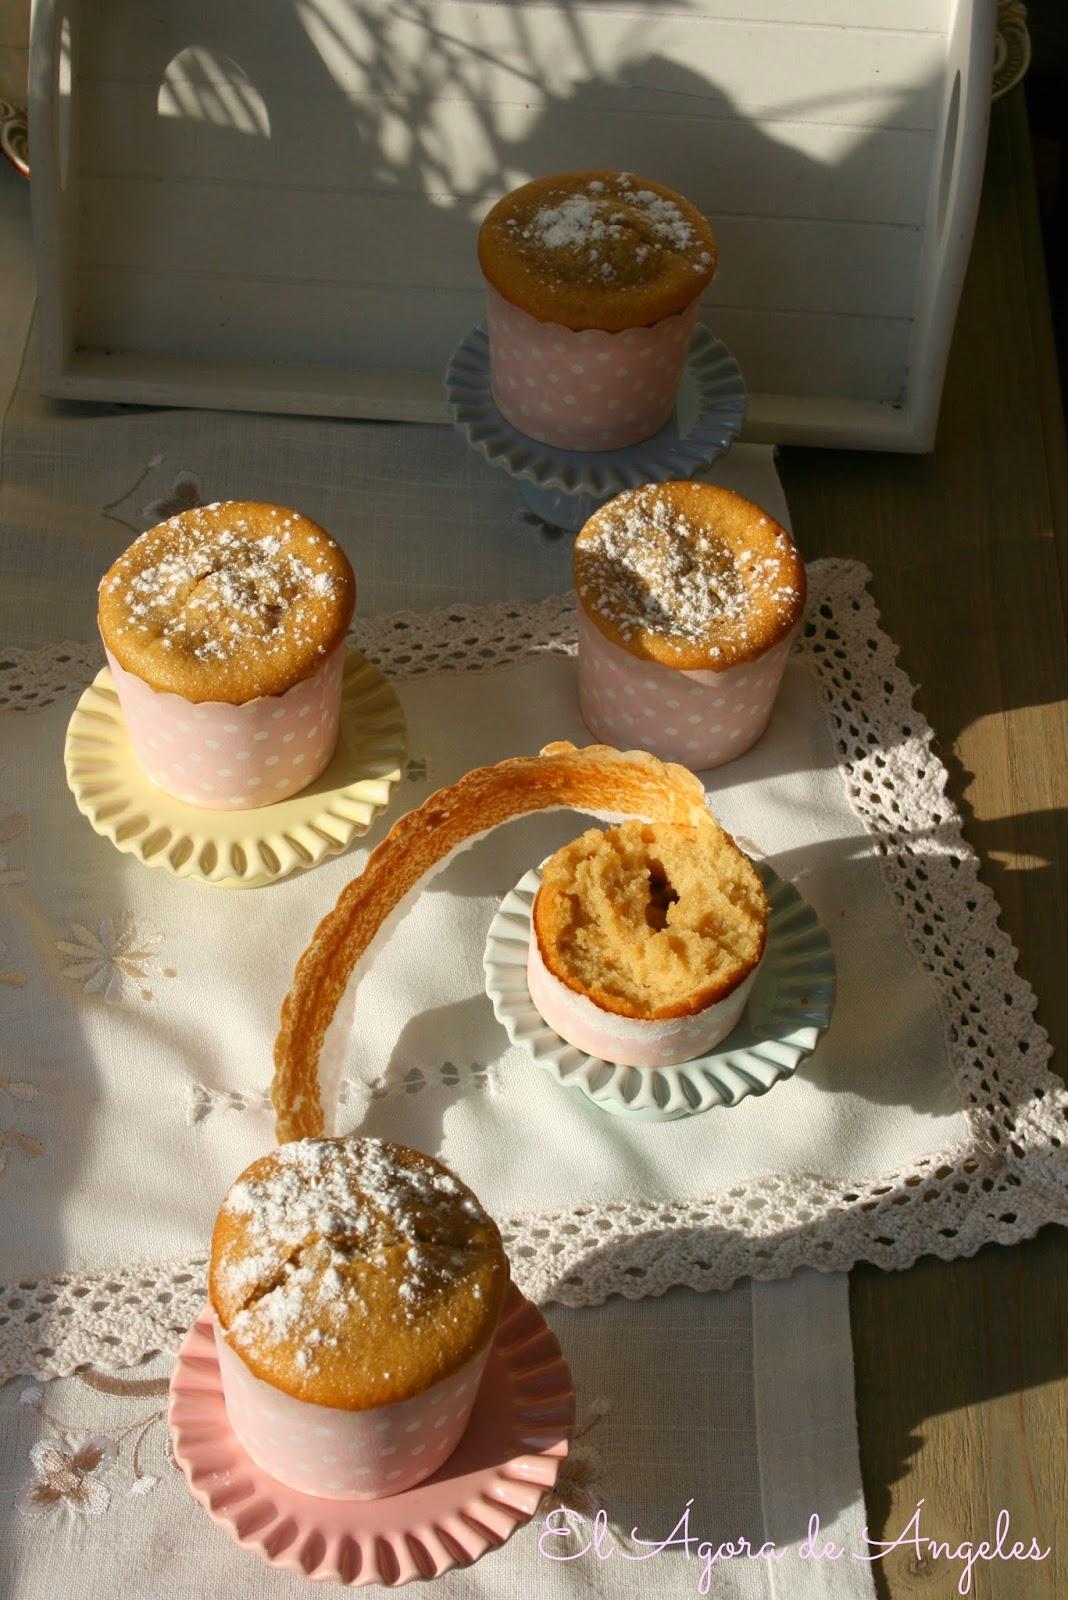 Muffins de compota de manzana,muffins de manzana, compota de manzan